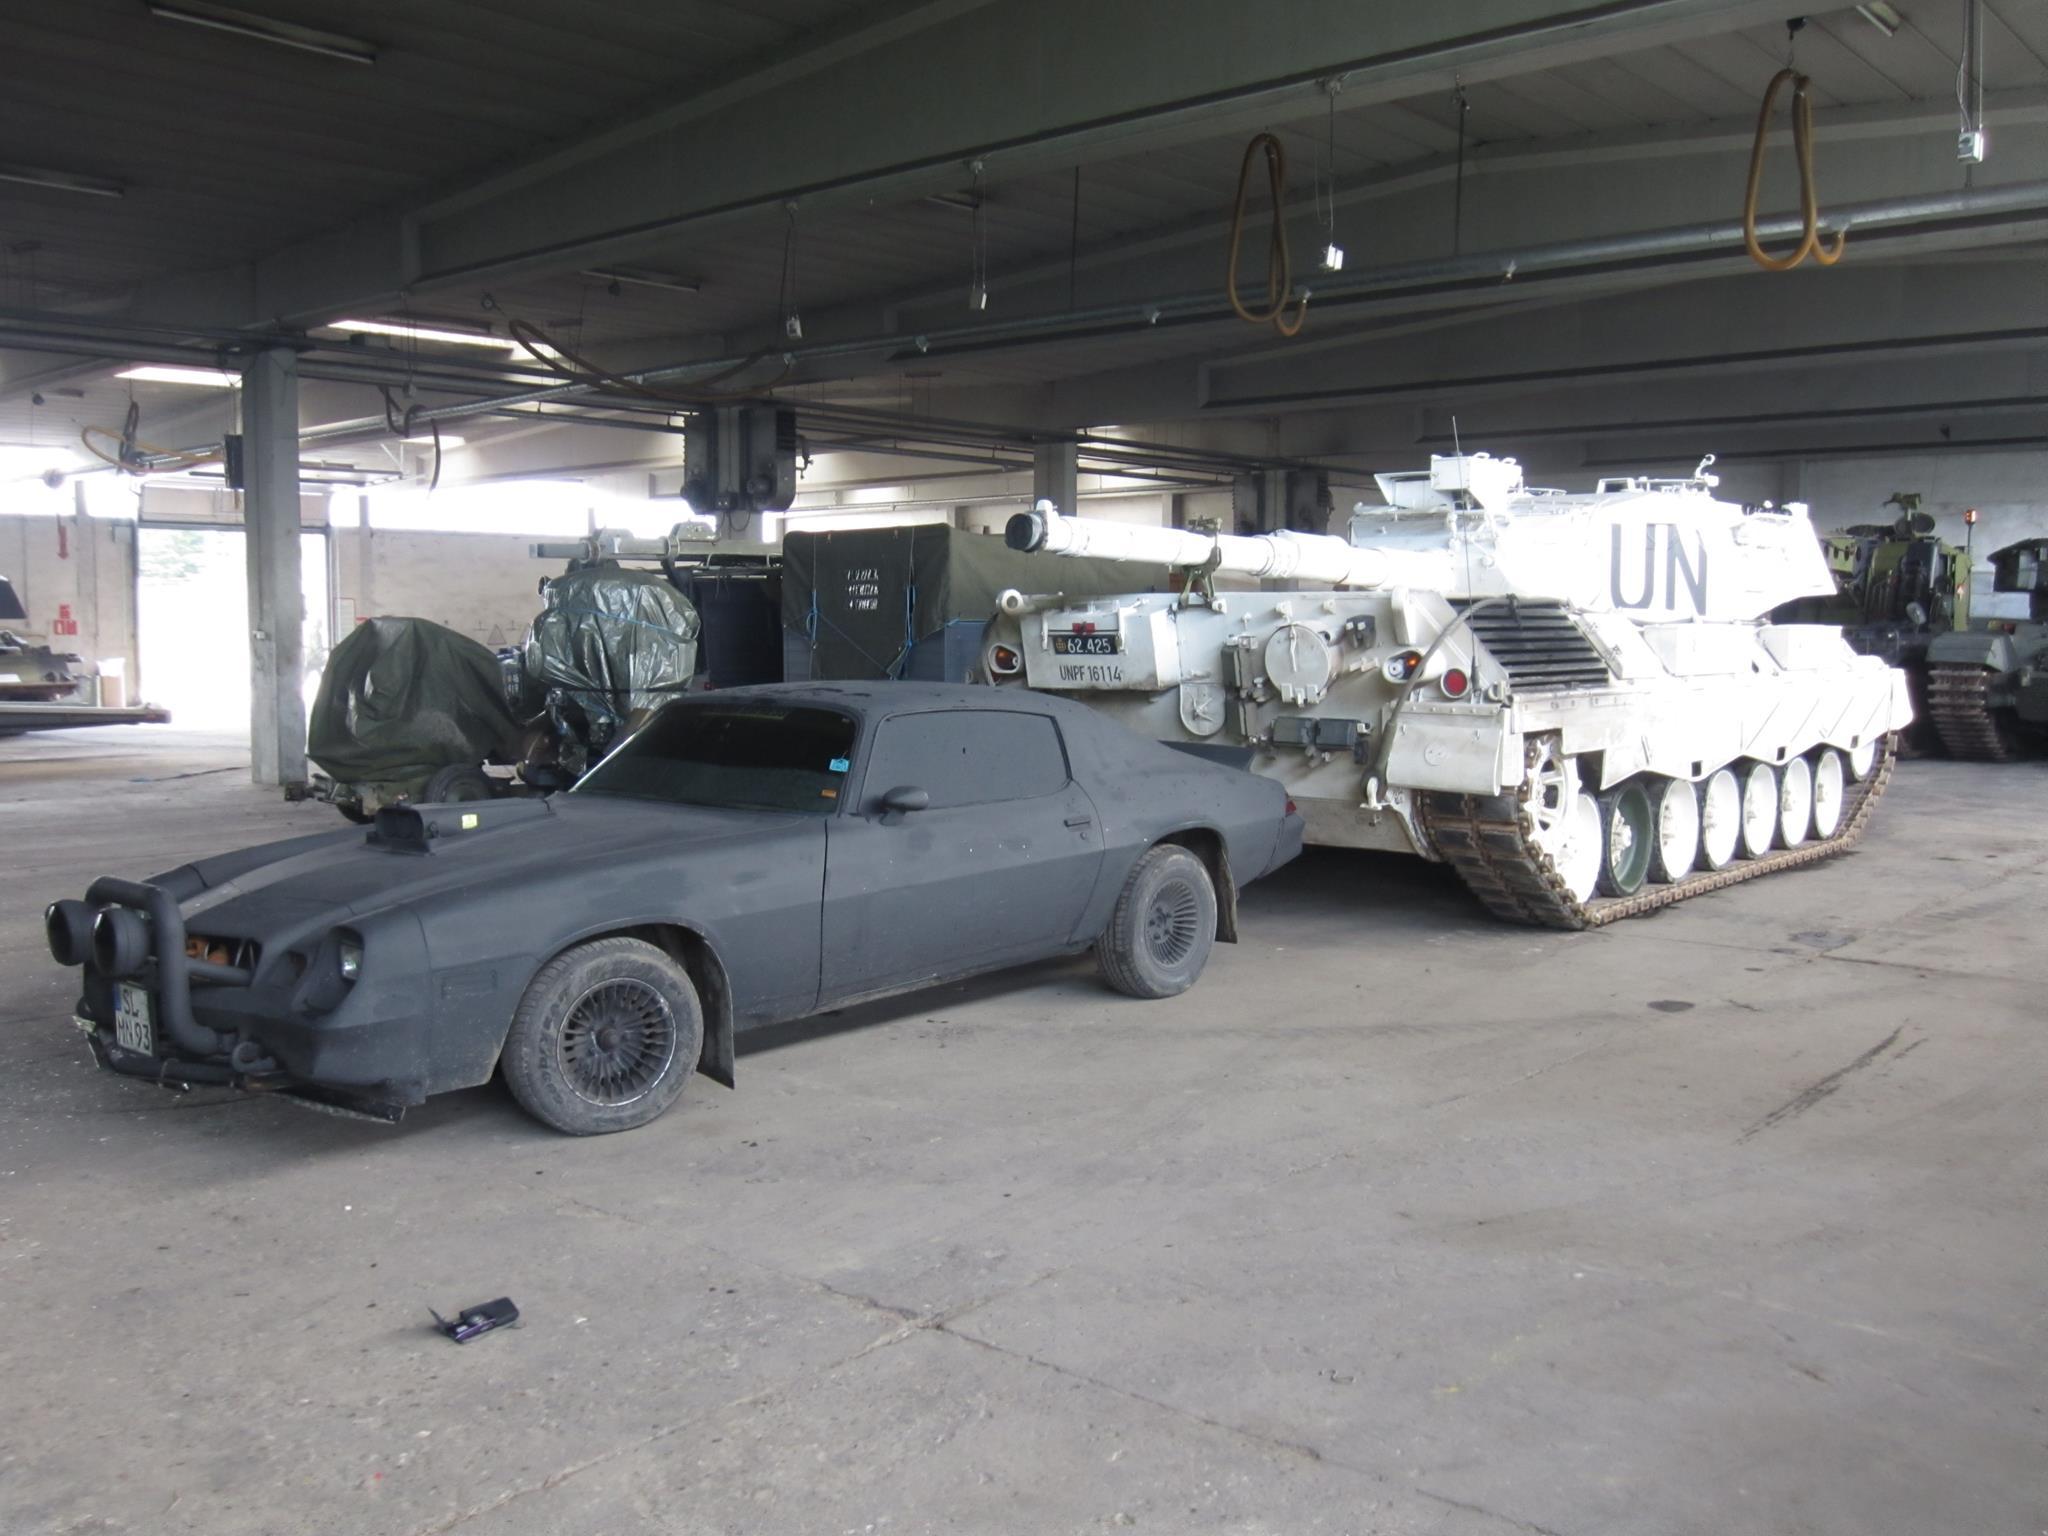 1979 Chevrolet War Camaro front three-quarter tank